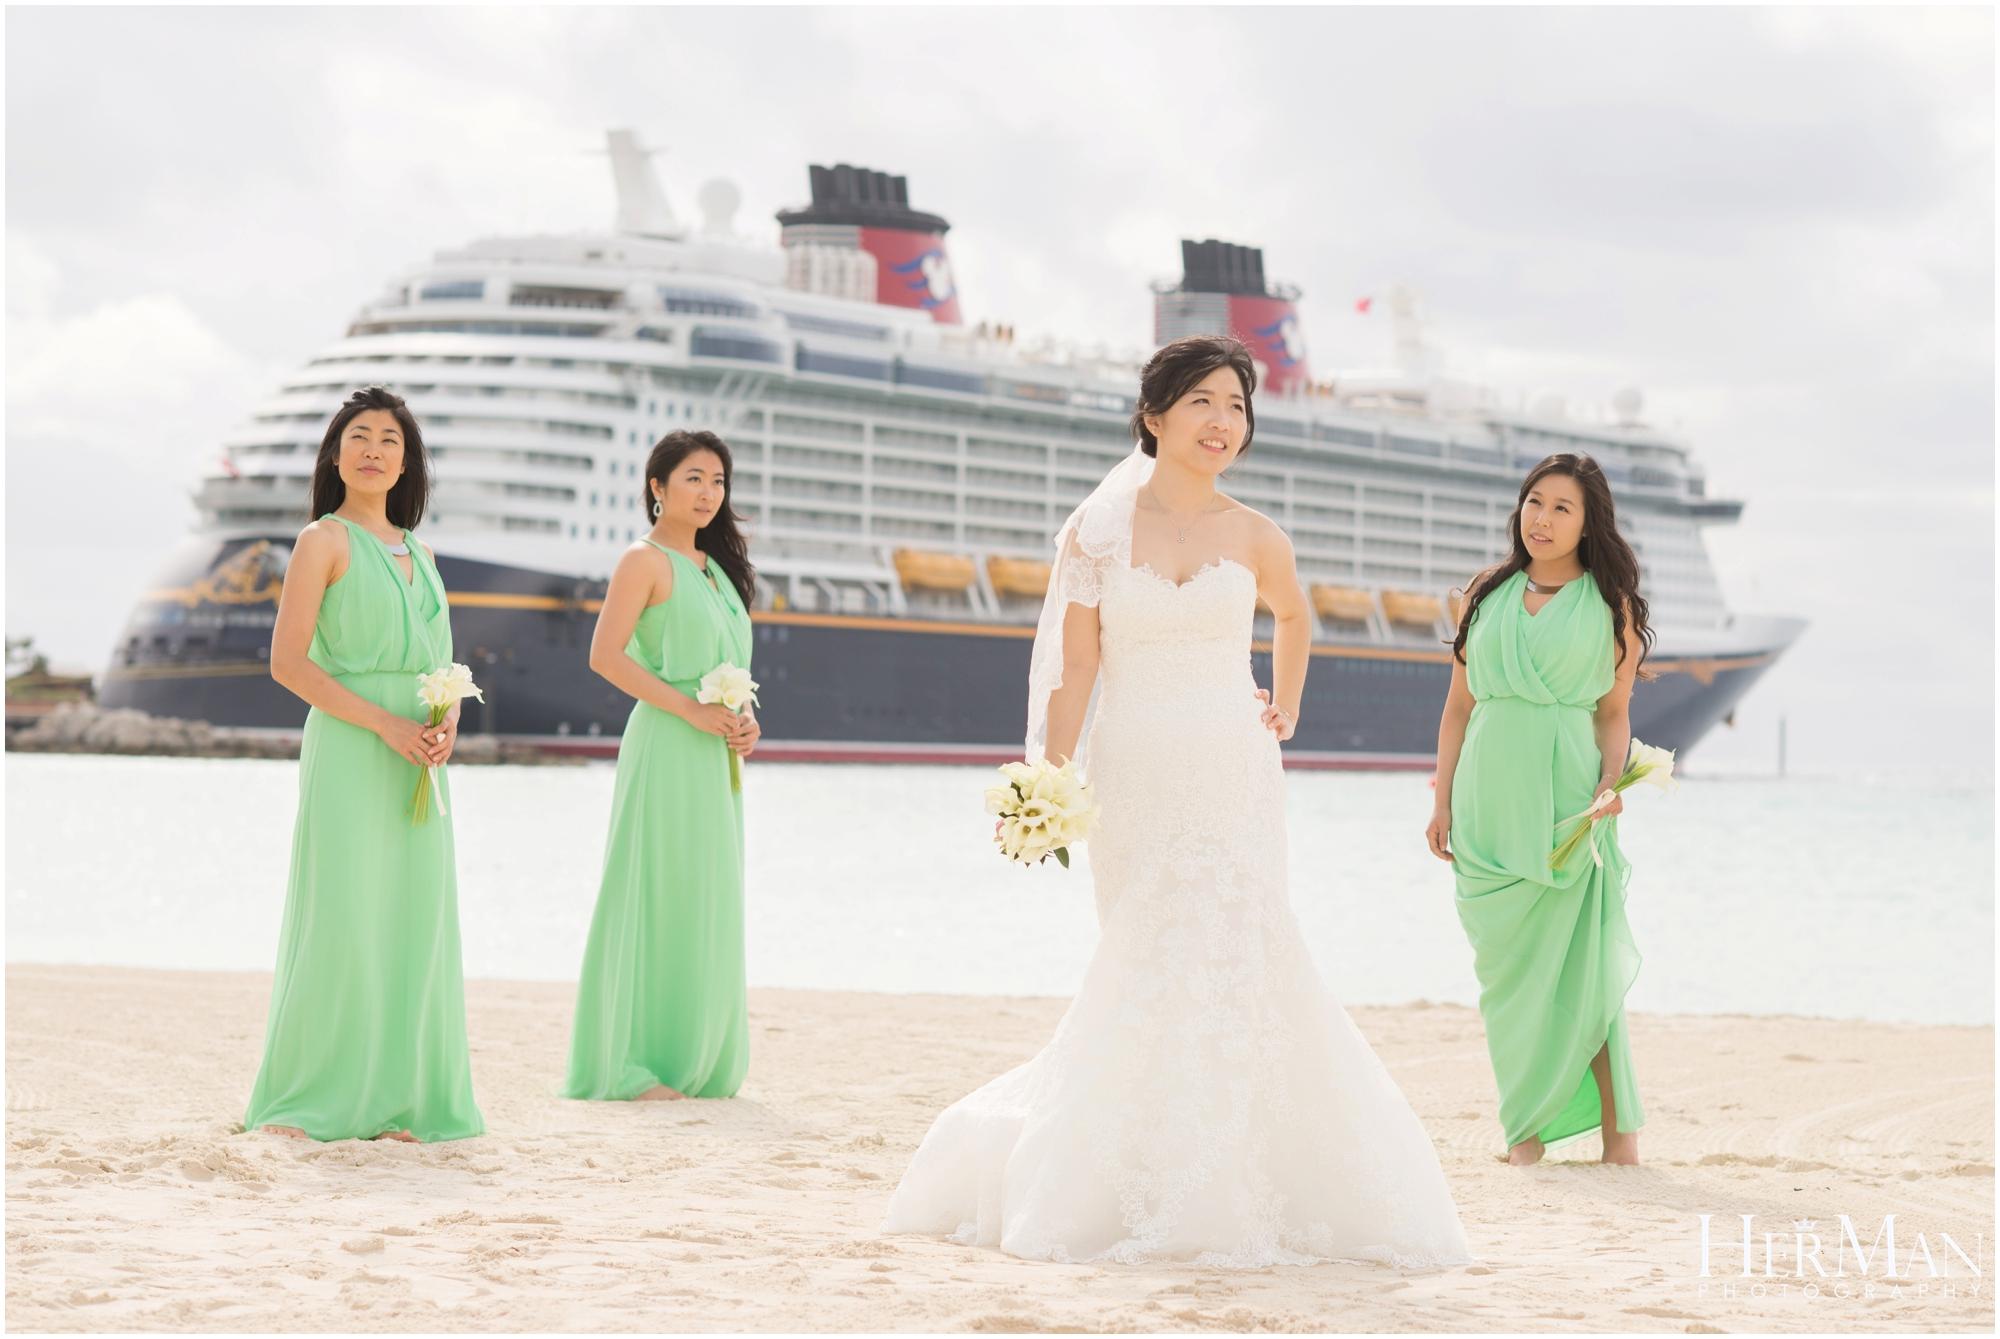 disney-fantasy-cruise-wedding-HerMan-photography_0042.jpg